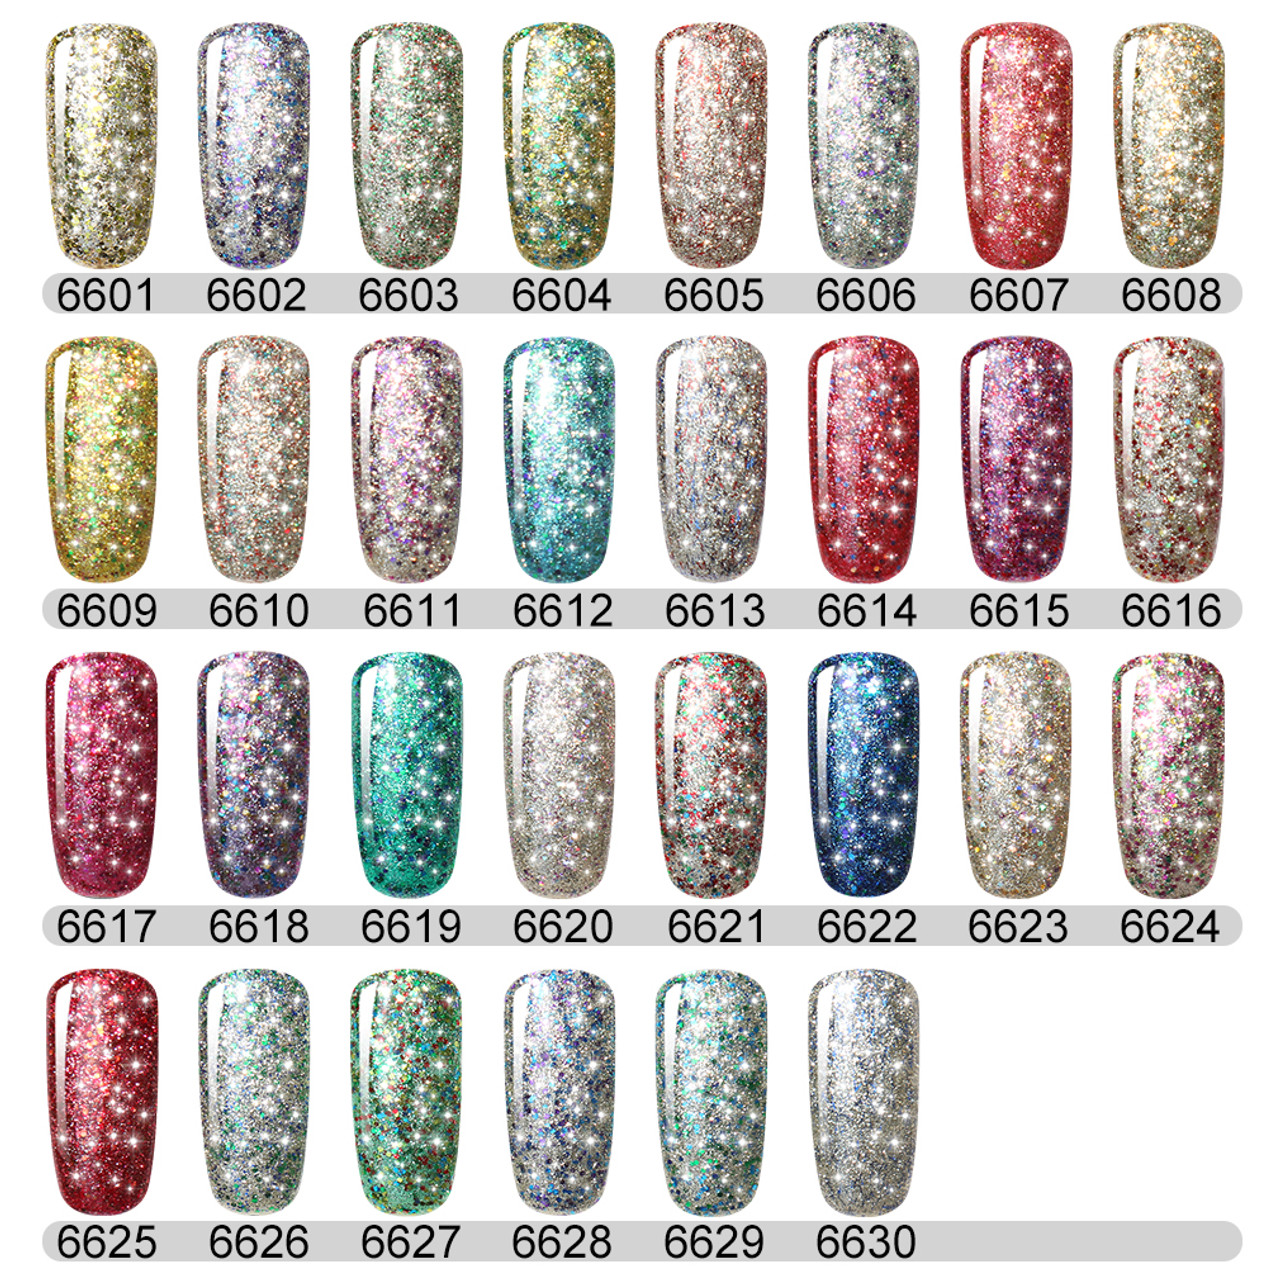 FairyGlo Bling Glitter Nail Polish 10ML Soak Off UV LED Lamp Gel ...